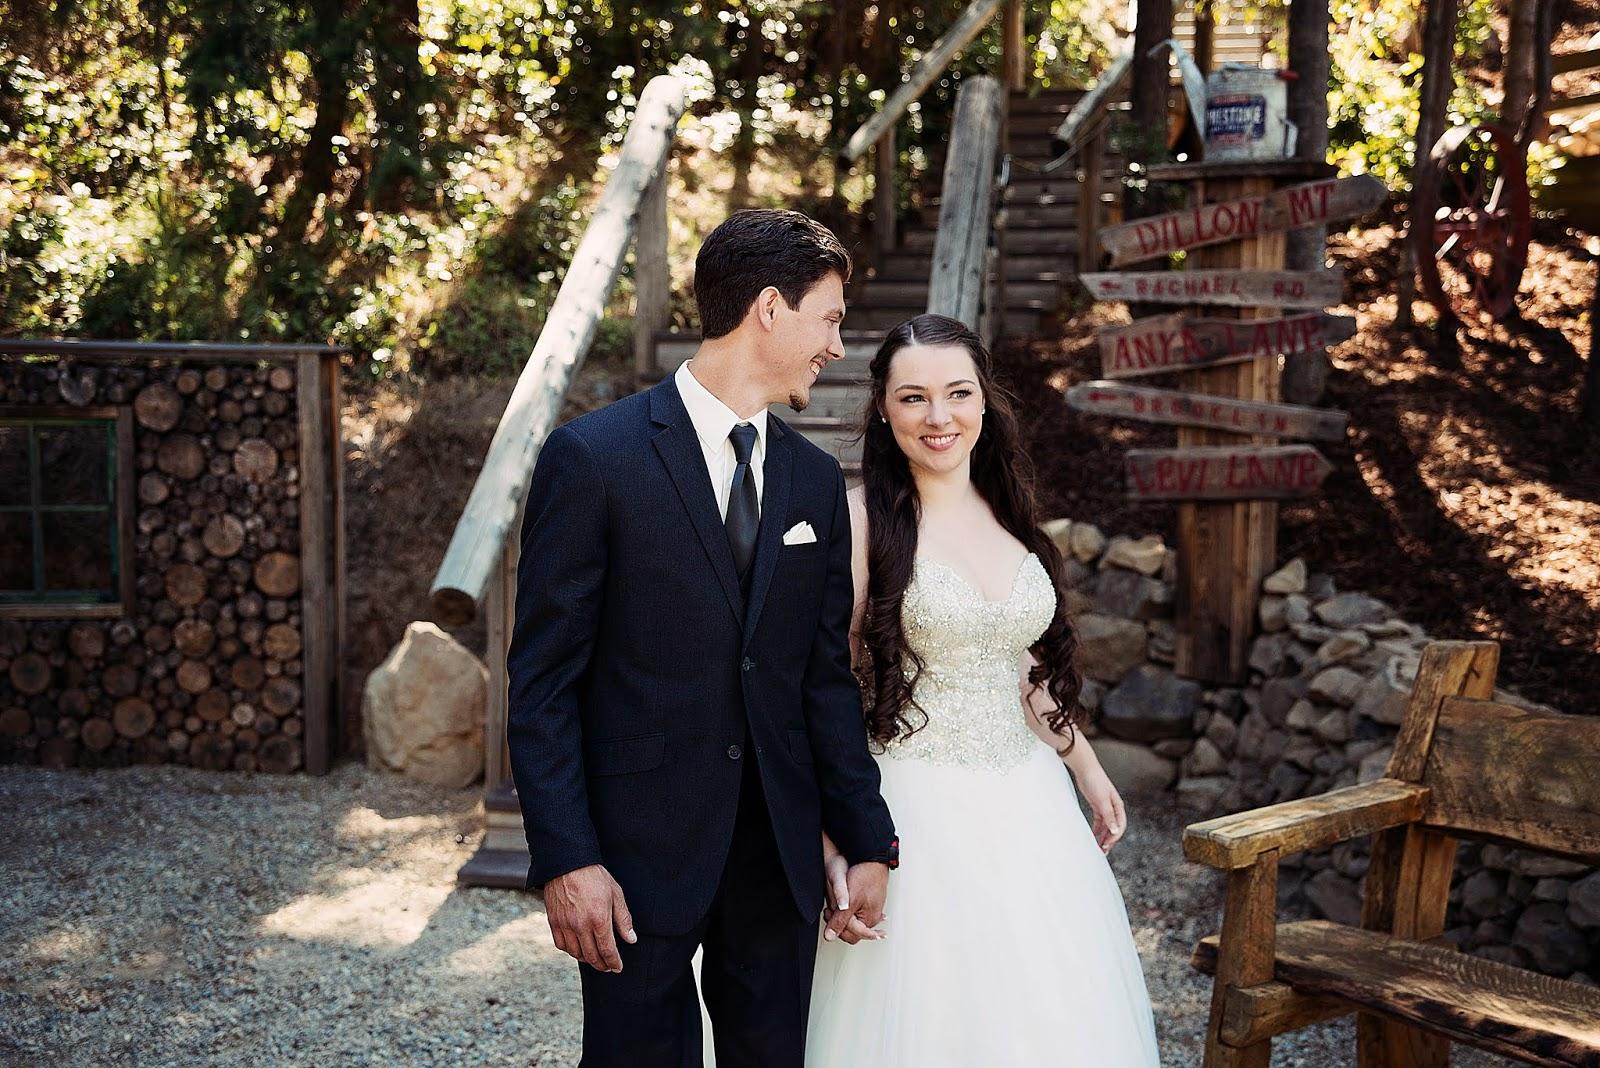 .Rachael & William Wedding.Spokane, WA wedding photographer-Julie Dawn Photography